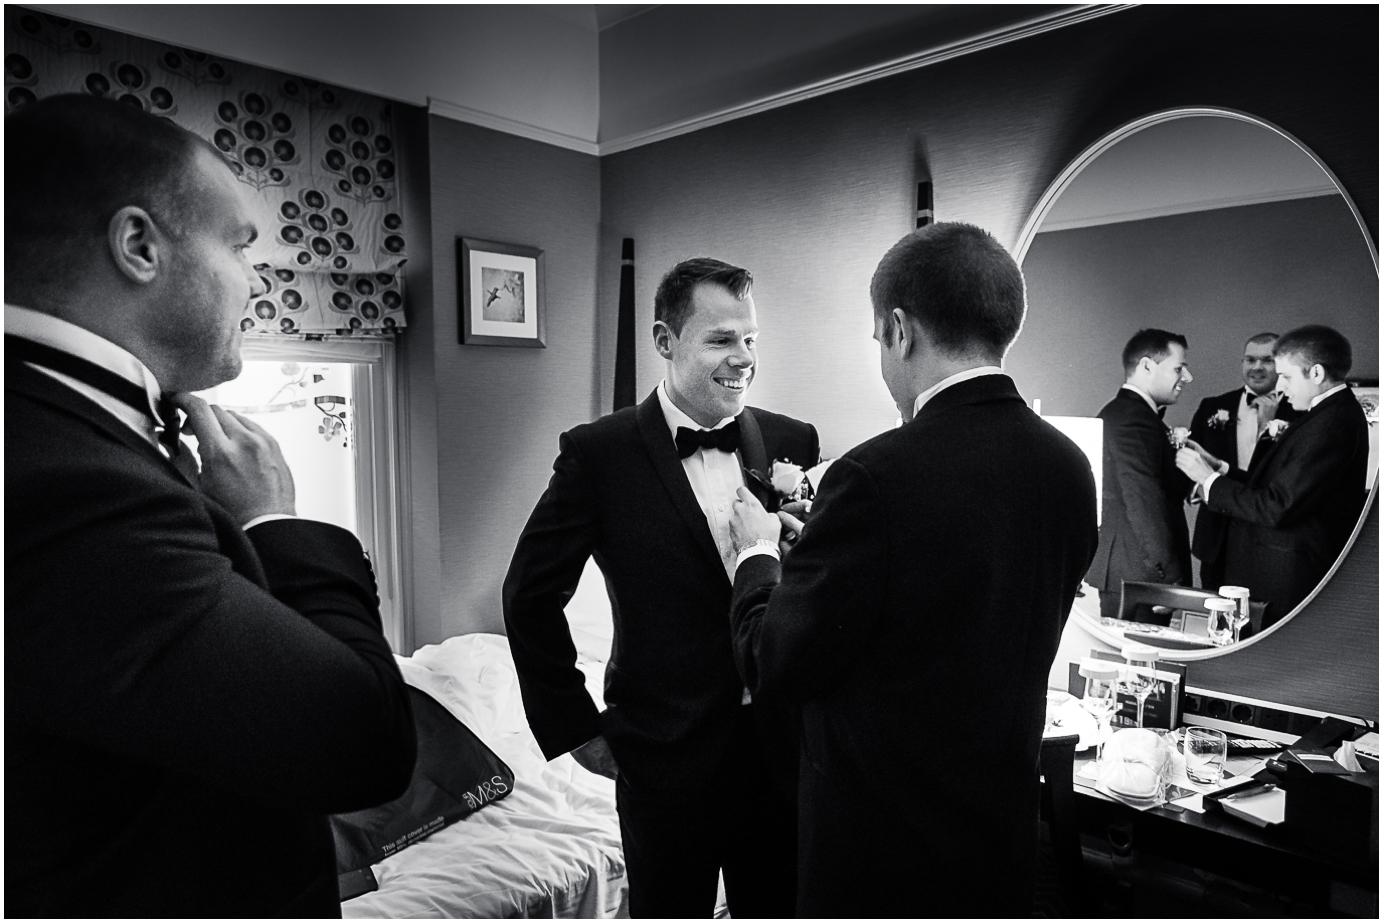 12 - Esmat and Angus - St. Ermin's Hotel London wedding photographer